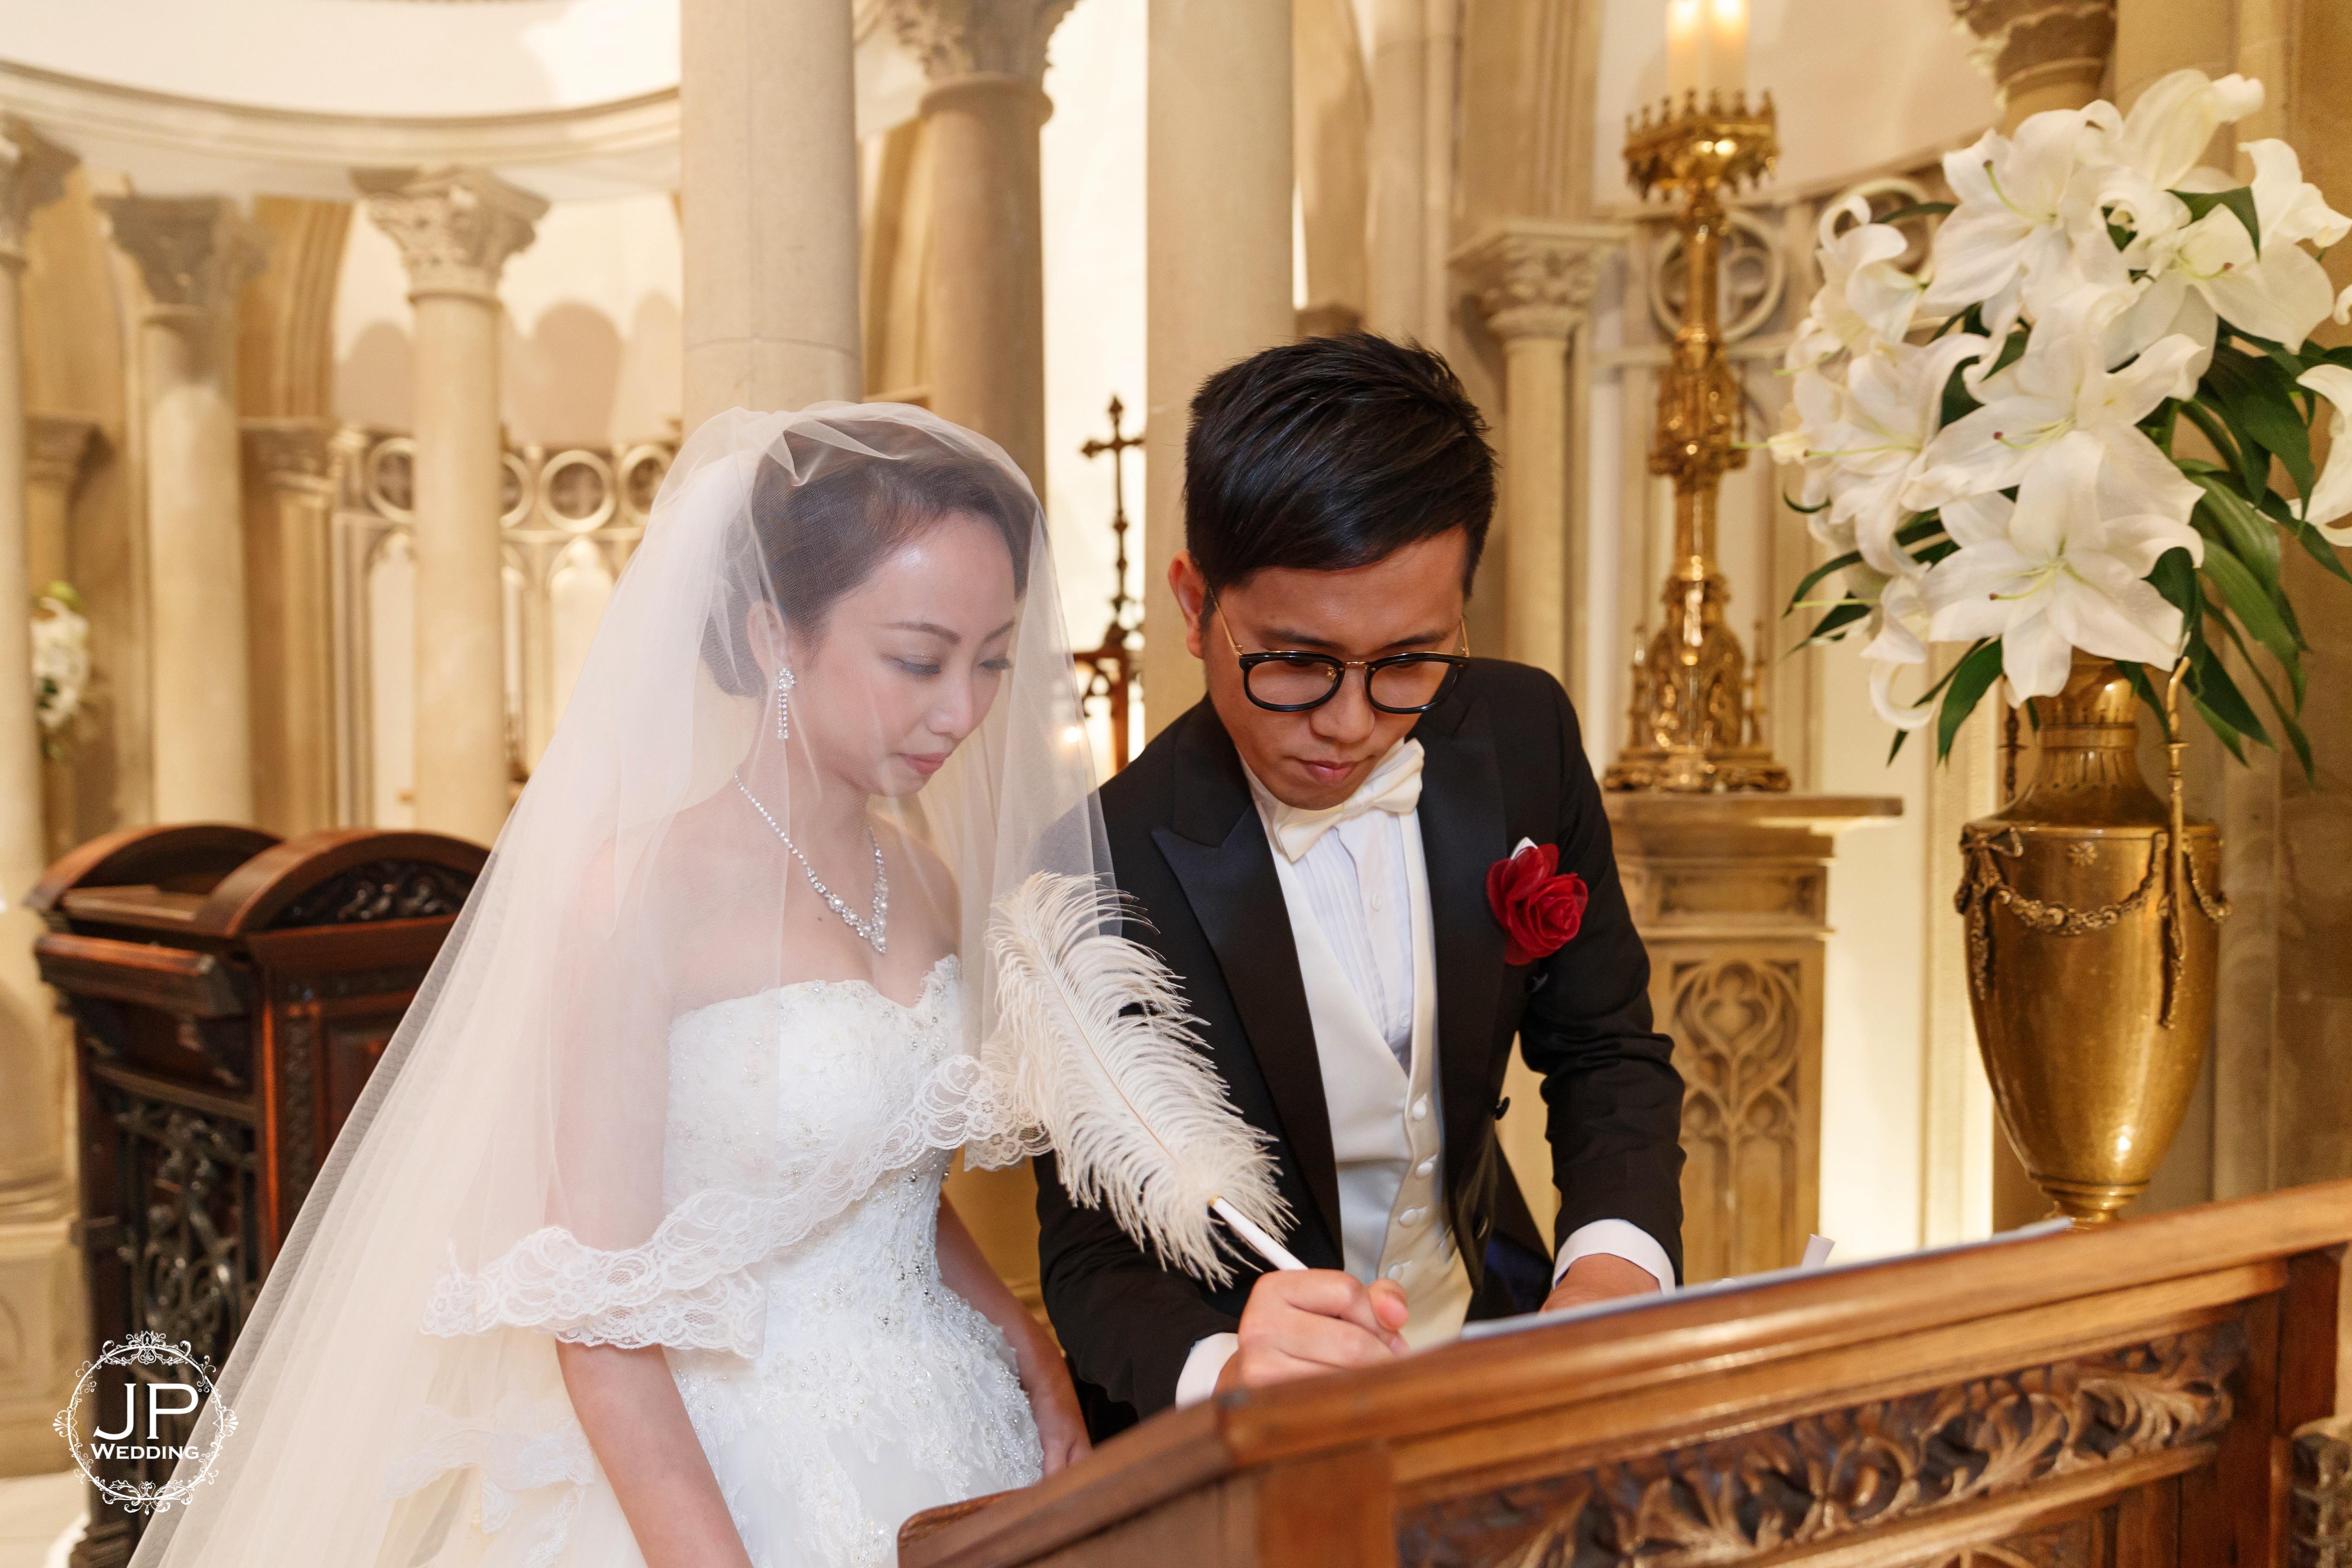 JP Wedding HK, Nagoya Glastonia 2018-13